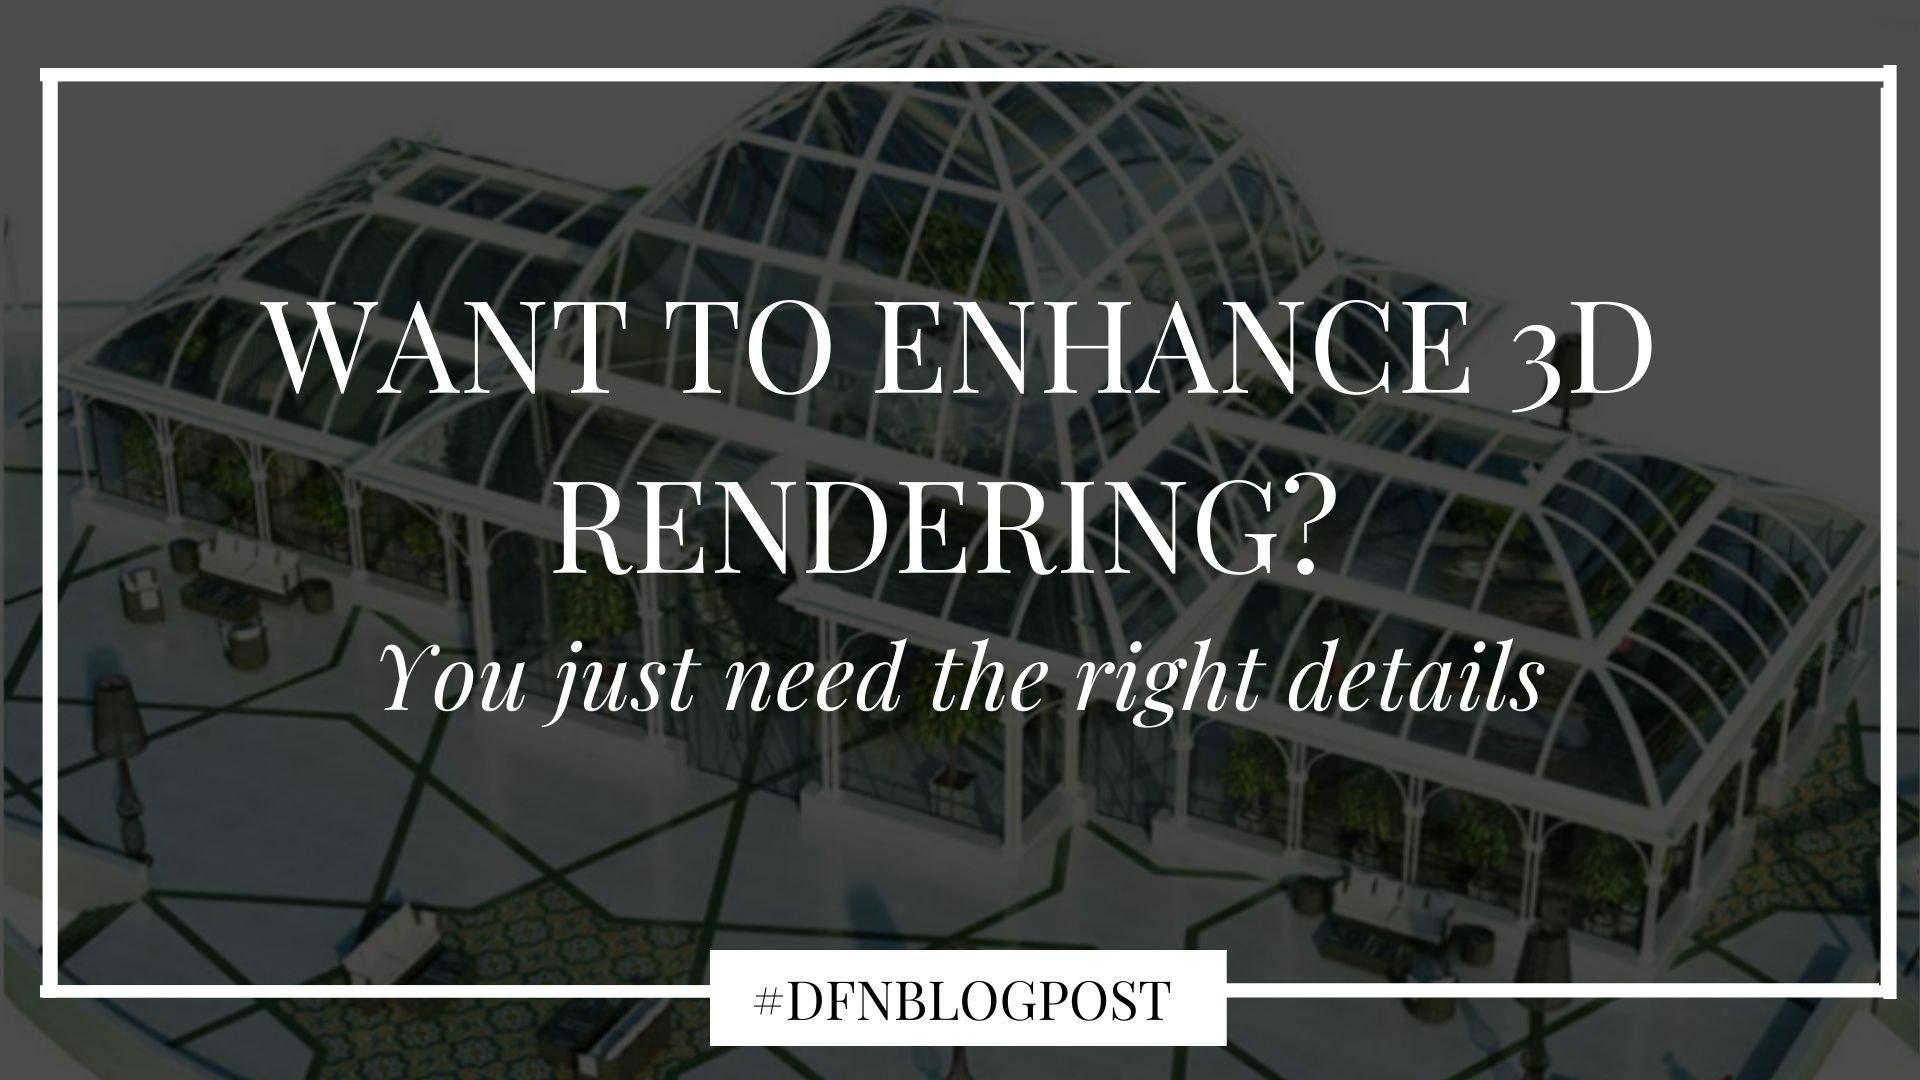 dfn-enhance-3d-rendering-cover